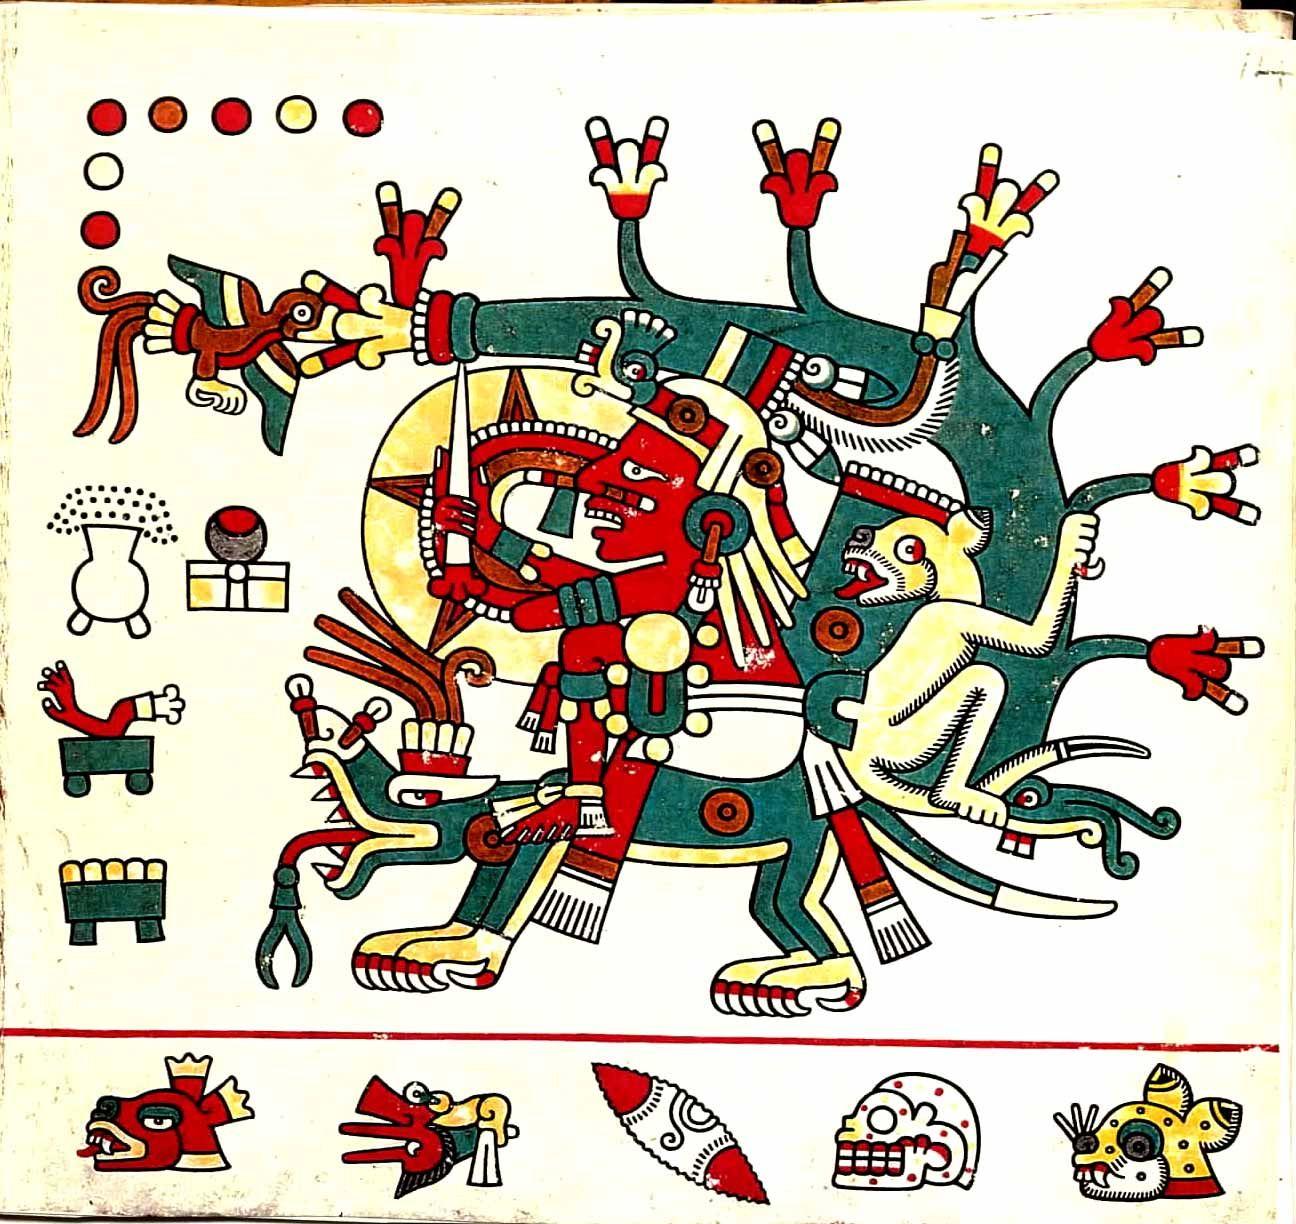 John Pohl S Ancient Books The Borgia Group Codex Laud Mayan Art Teotihuacan Art Art